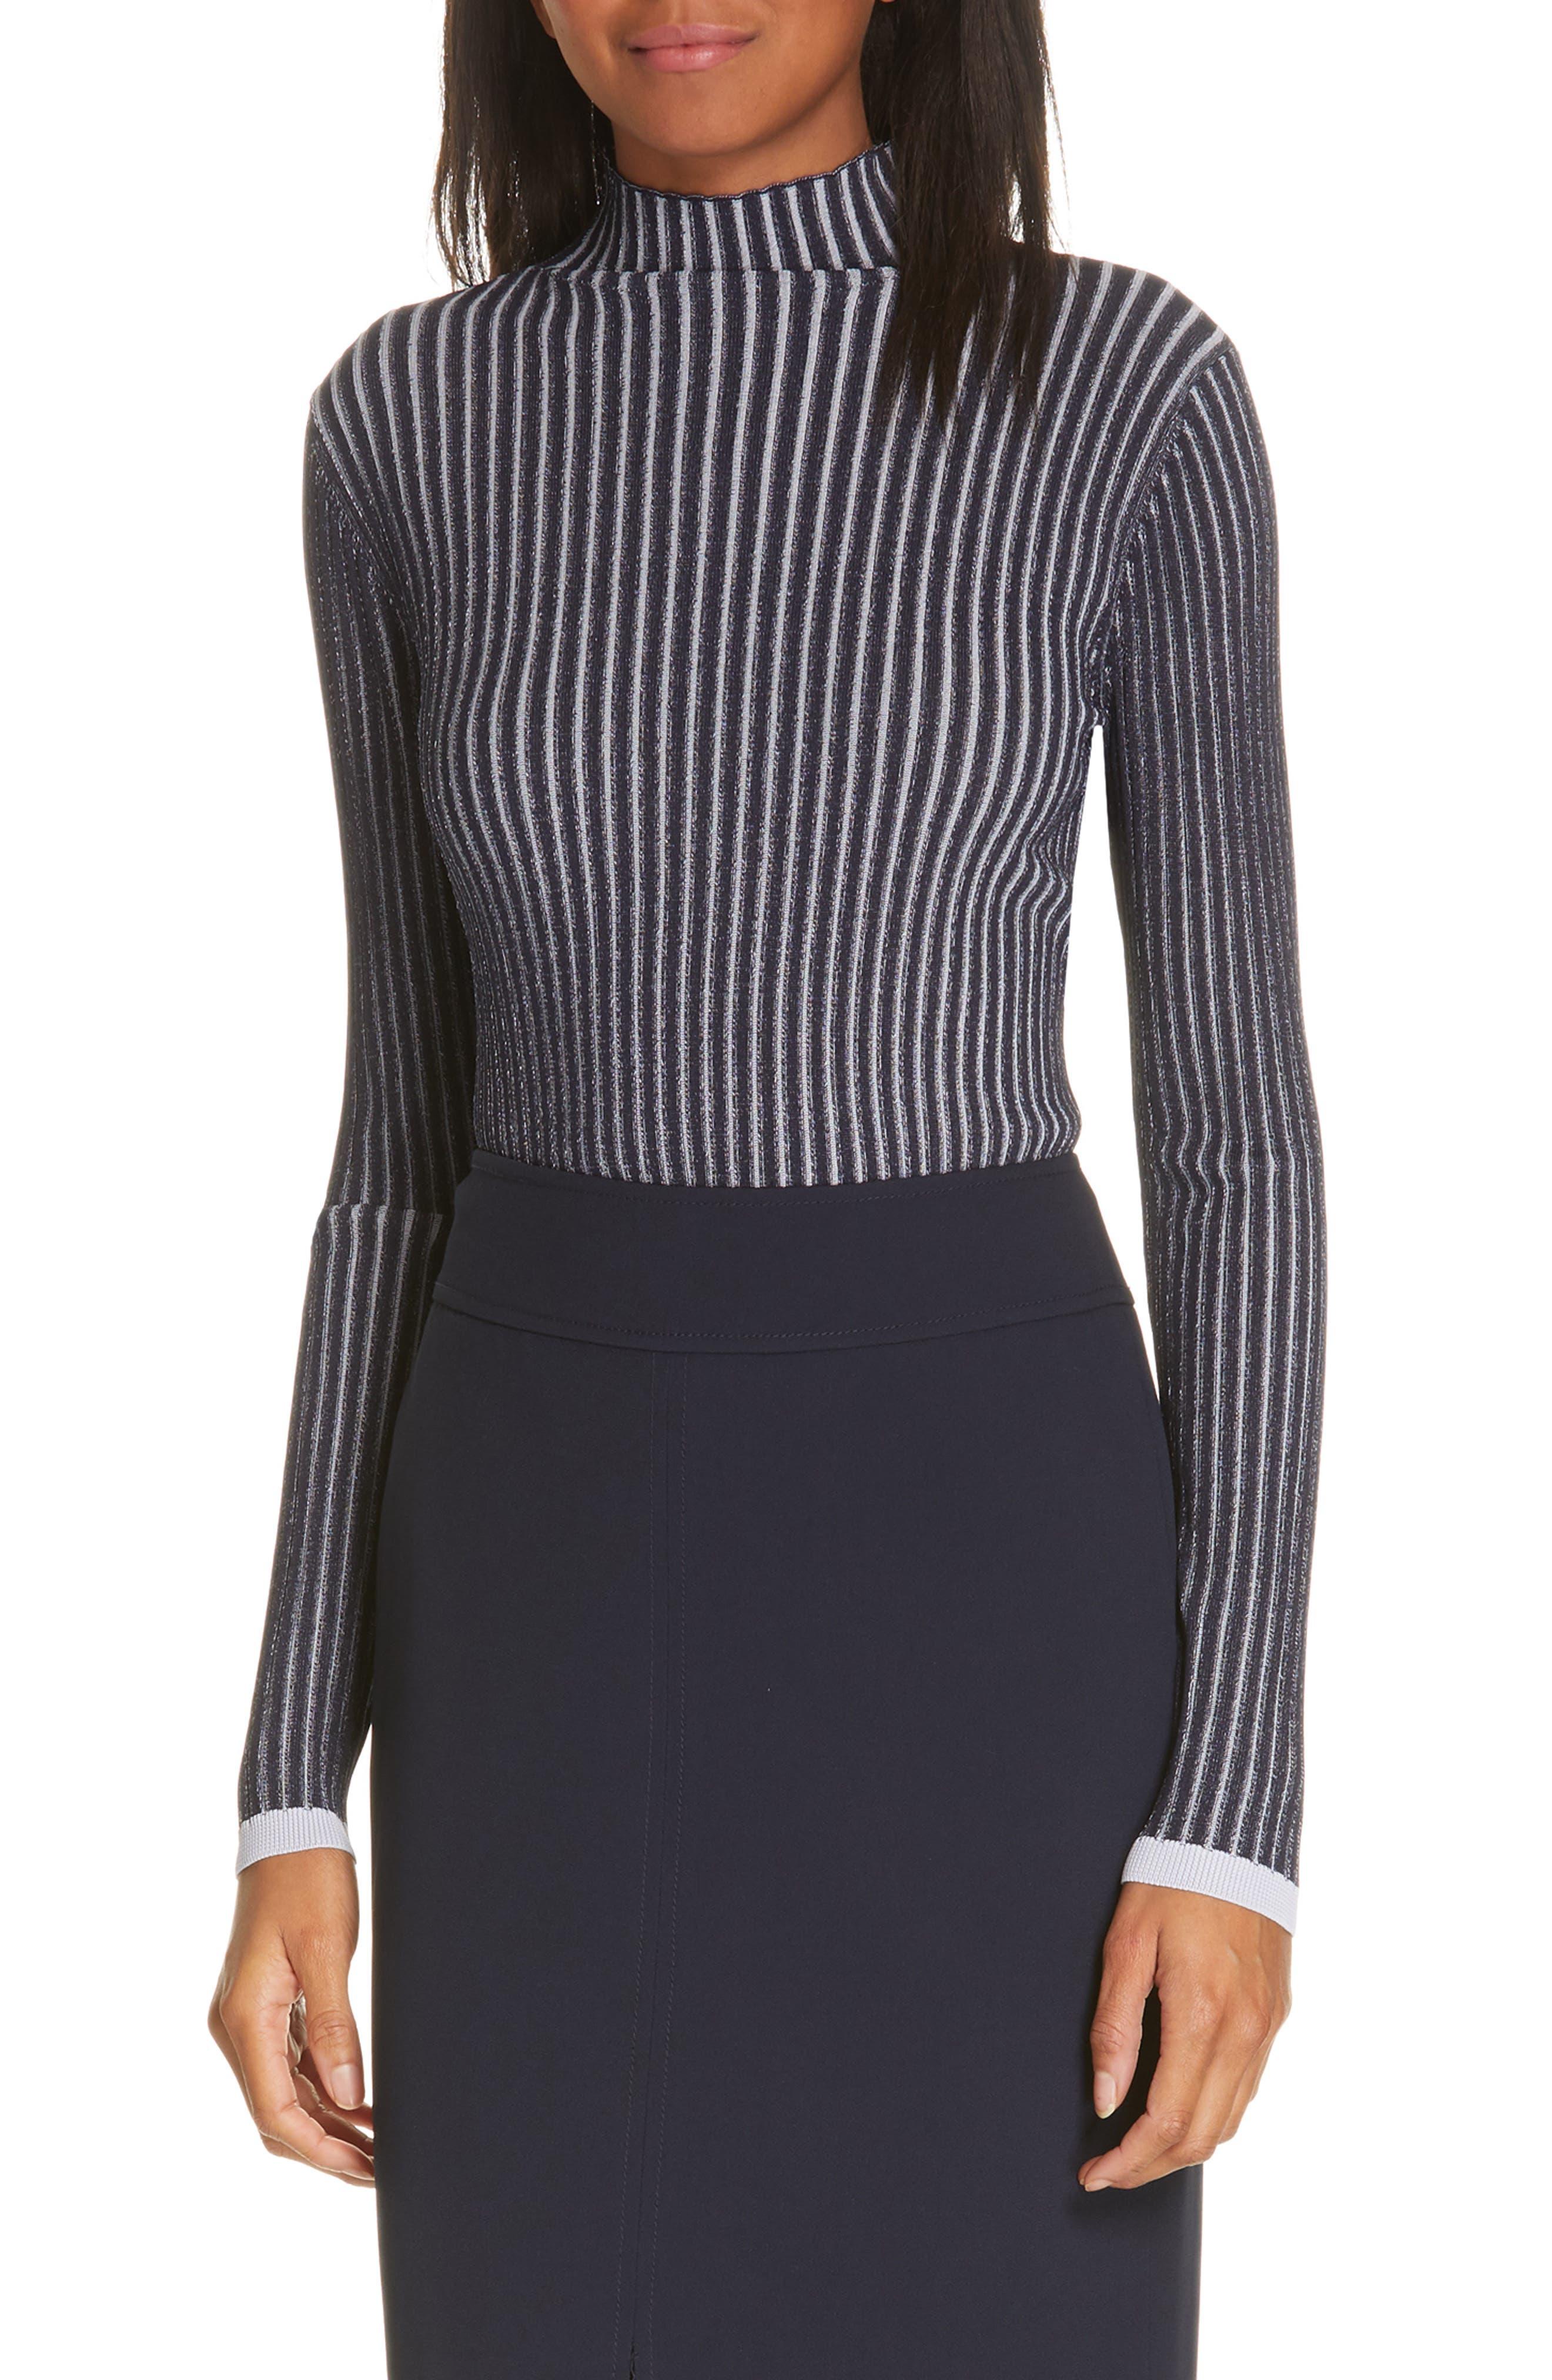 LEWIT Stripe Ribbed Mock Neck Sweater, Main, color, NAVY ICELANDIC STRIPE